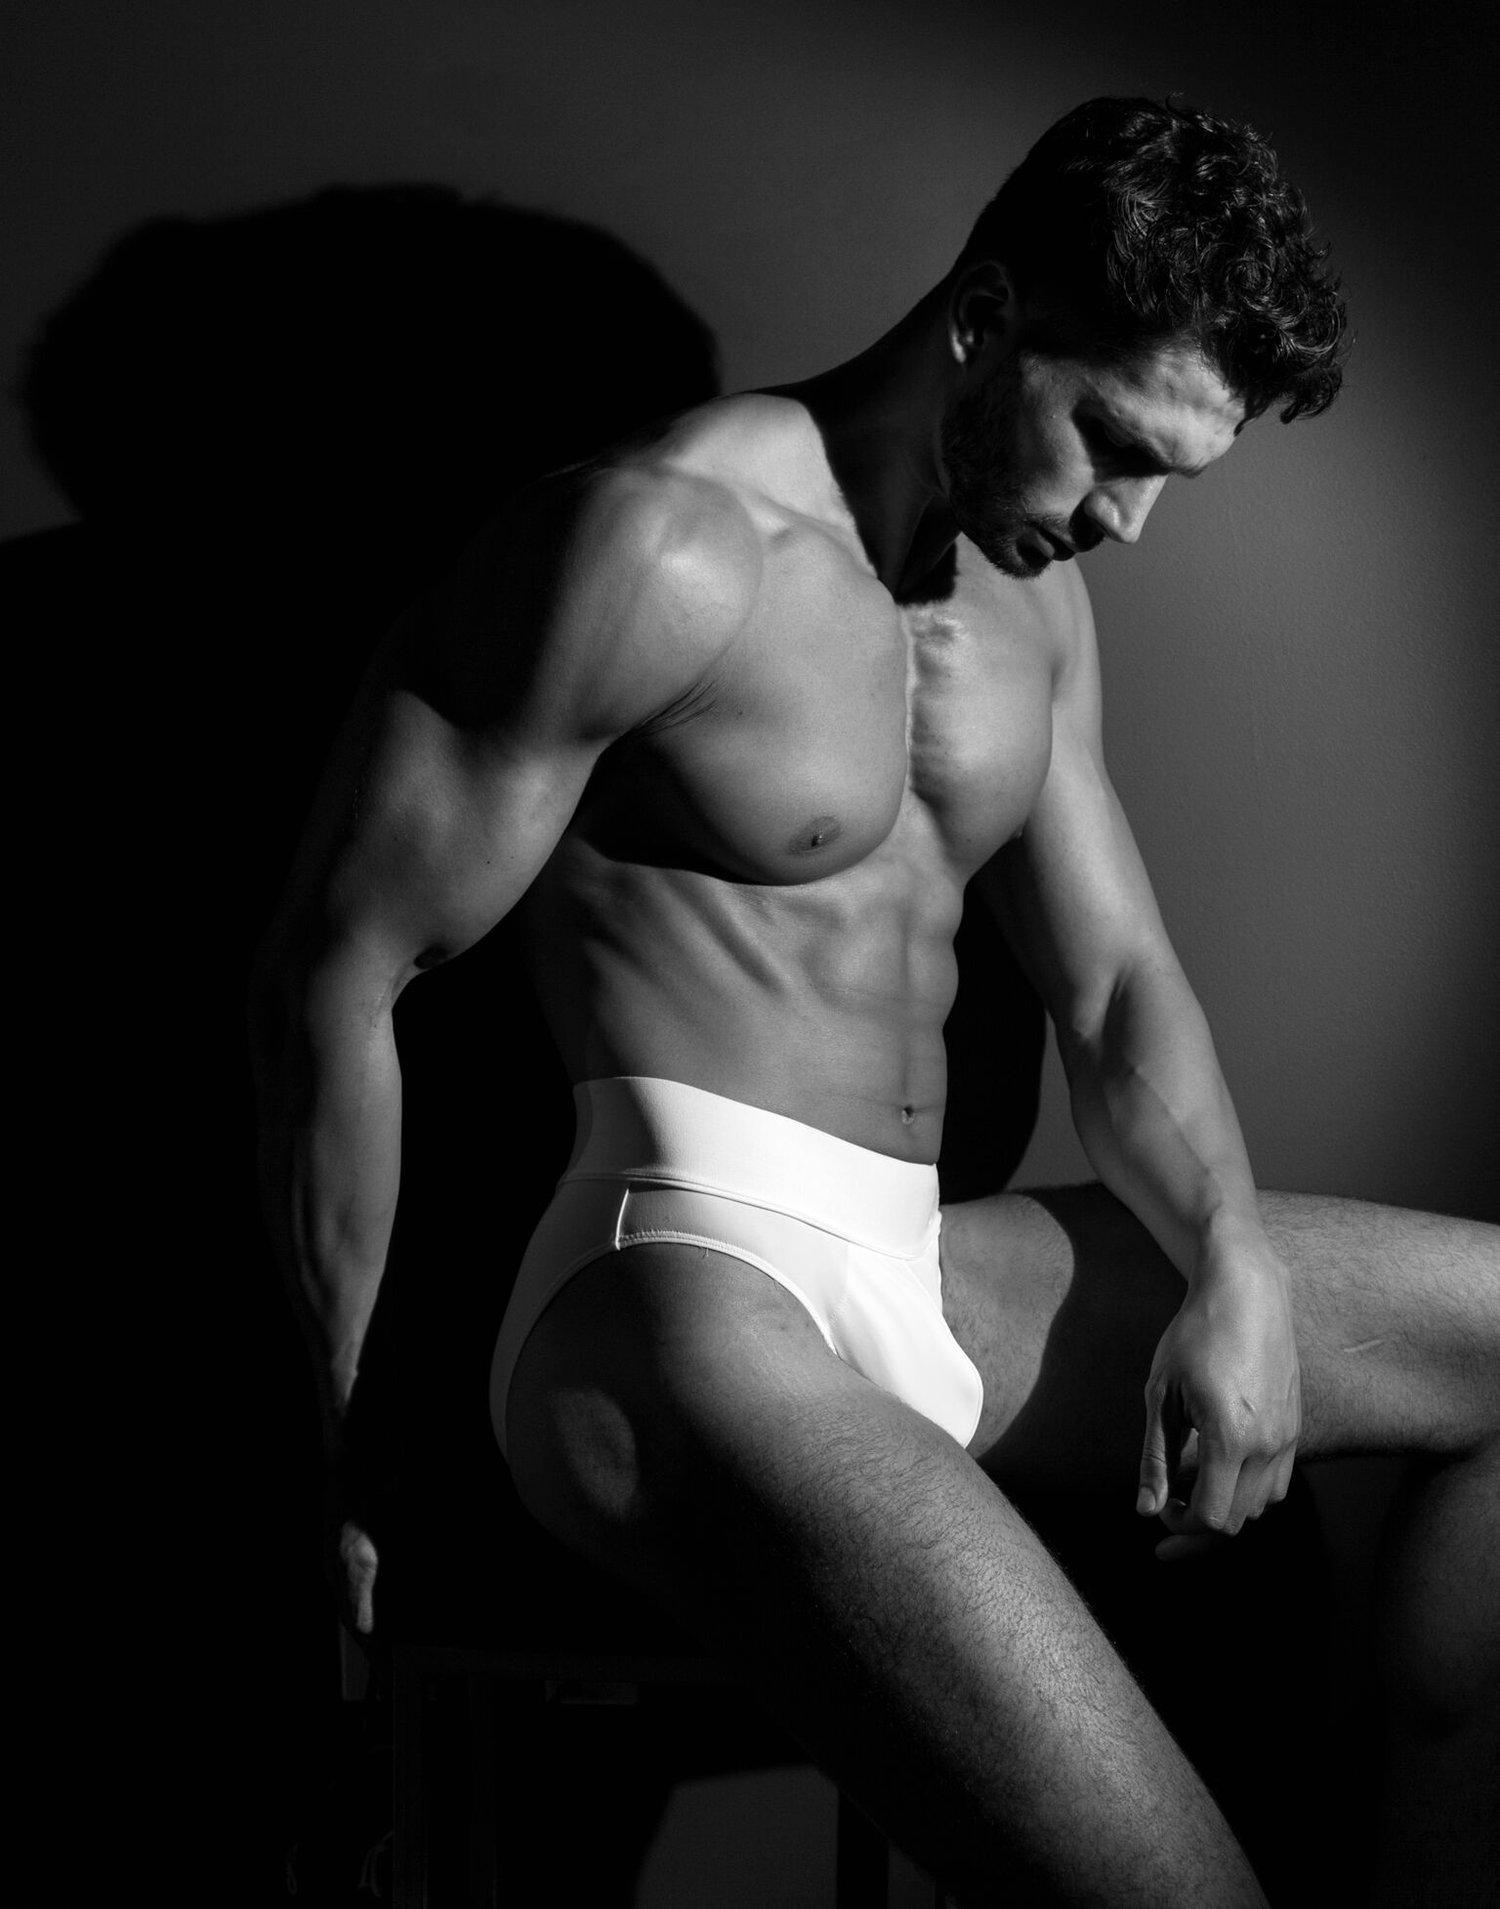 Adon Exclusive: Model Rudy Bundini By Harol Baez